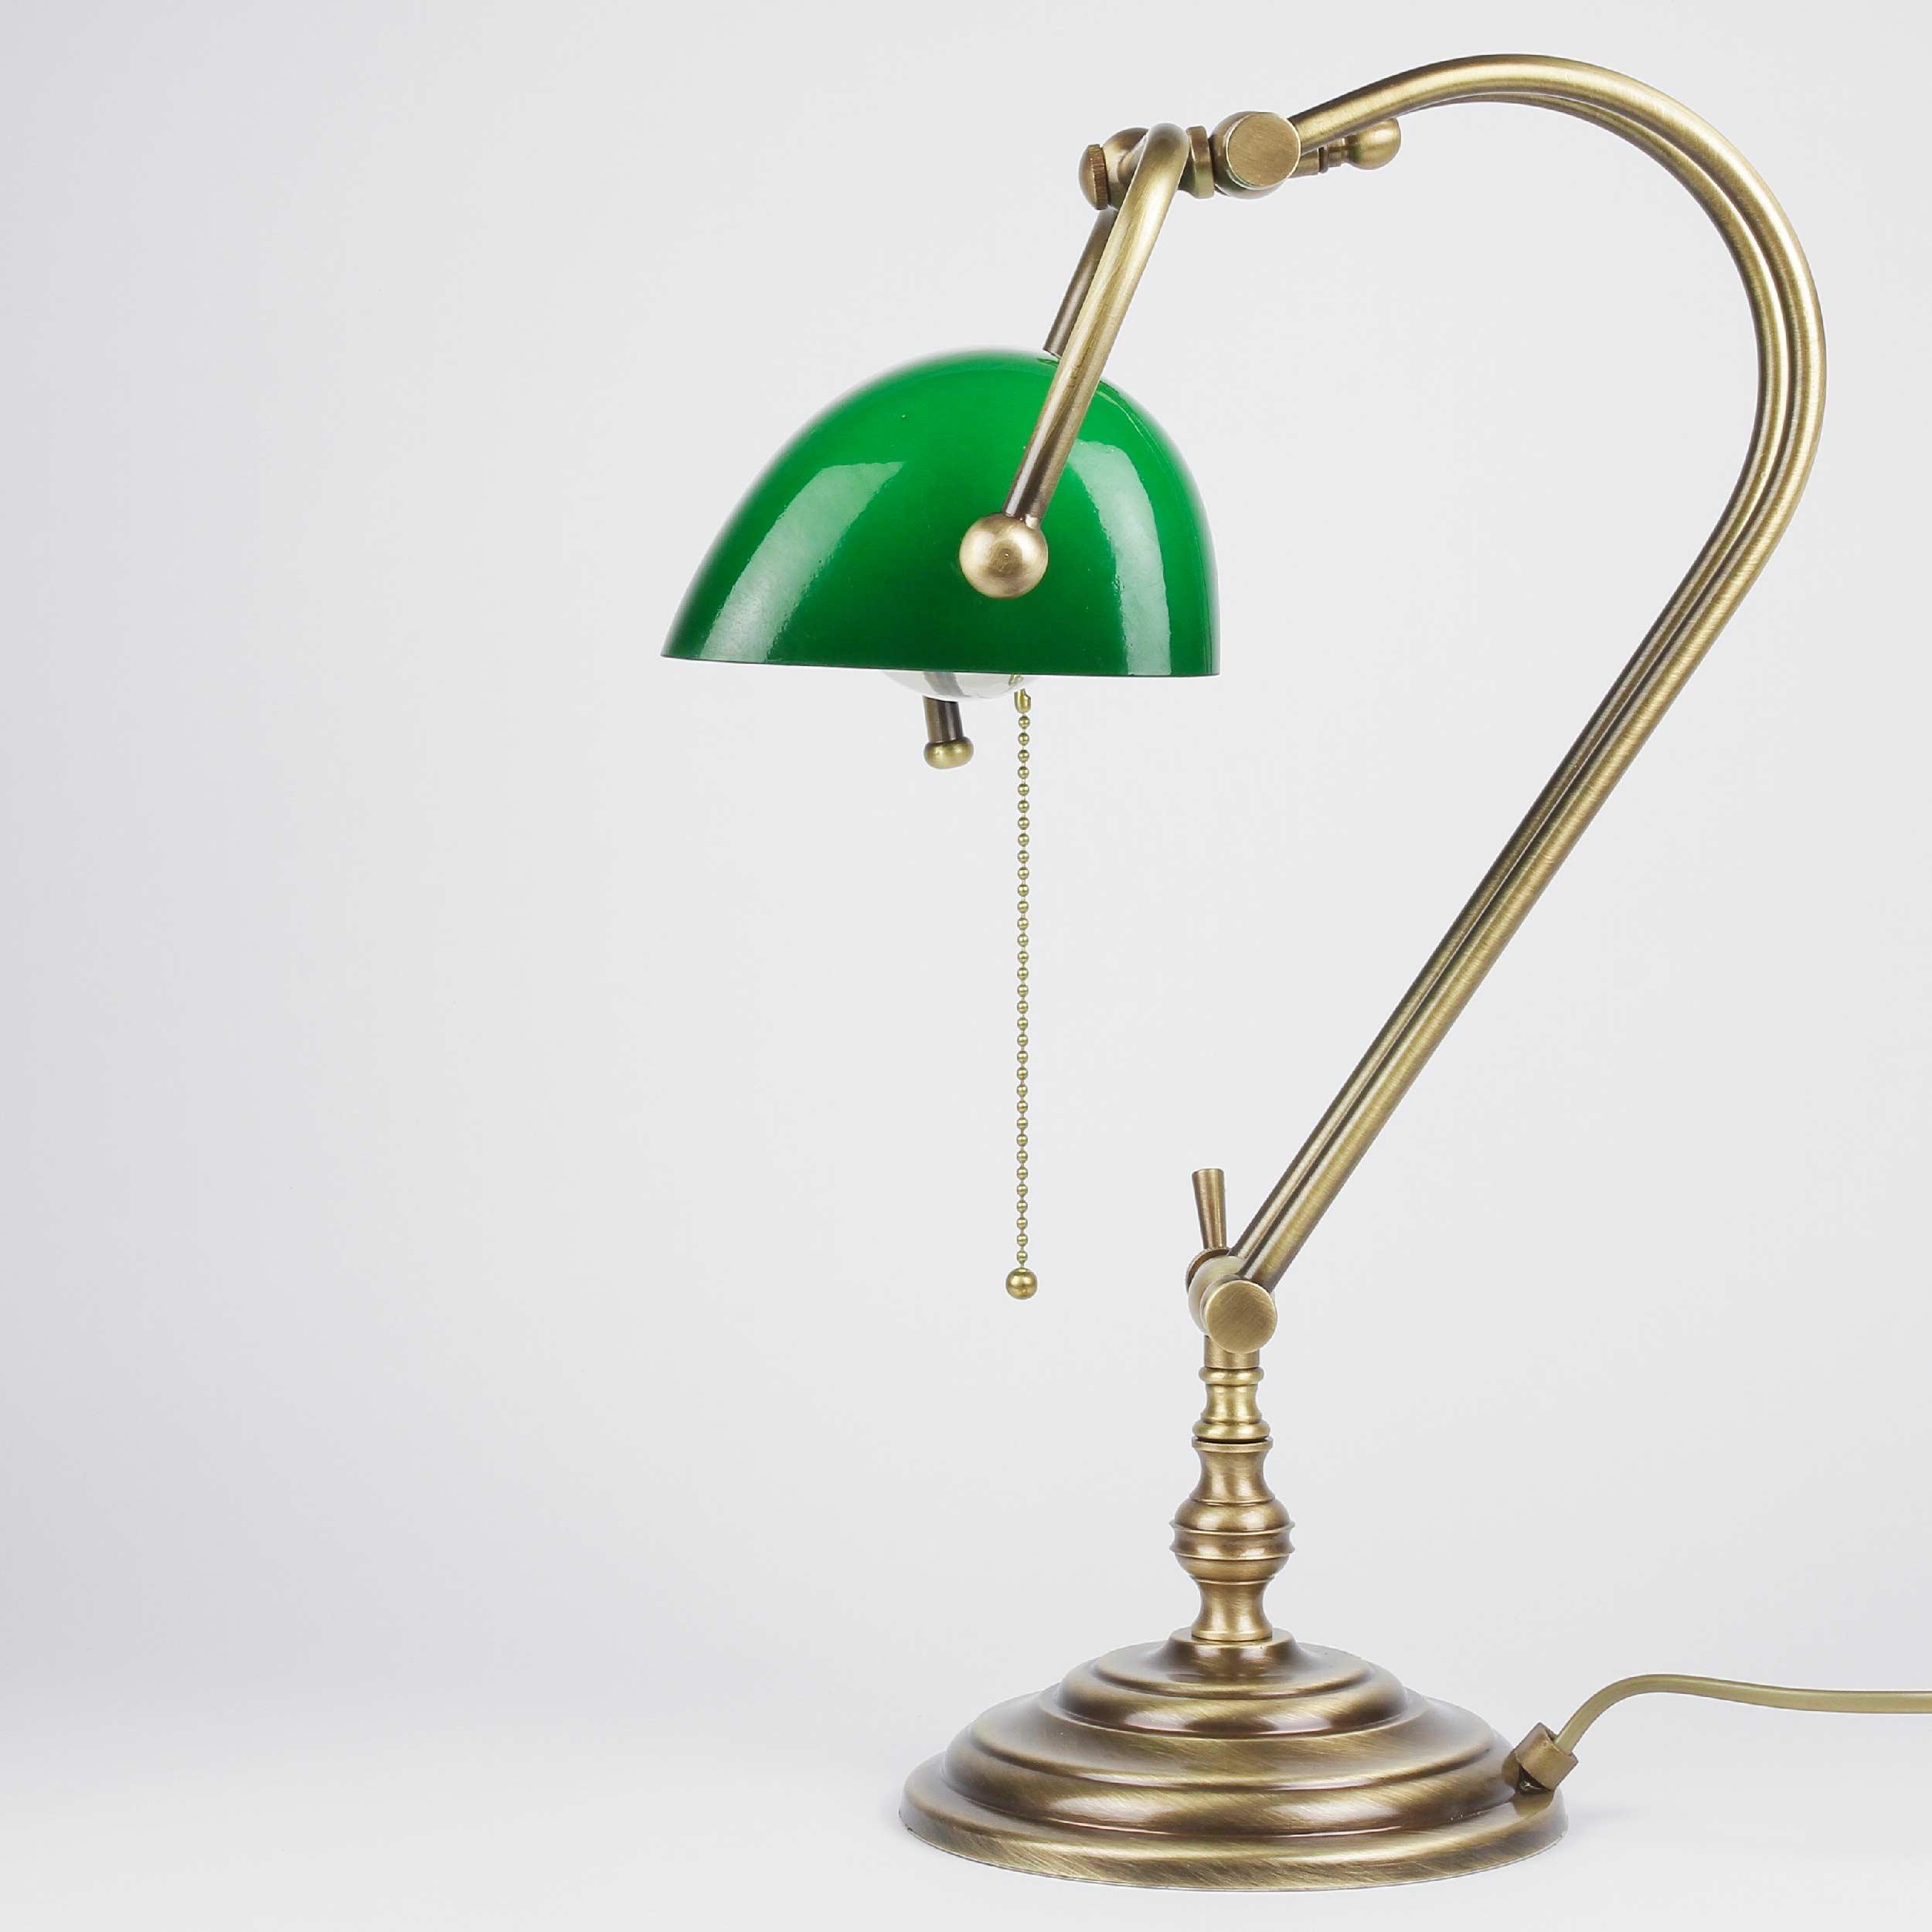 Banker Tischlampe aus Echt-Messing in Bronze